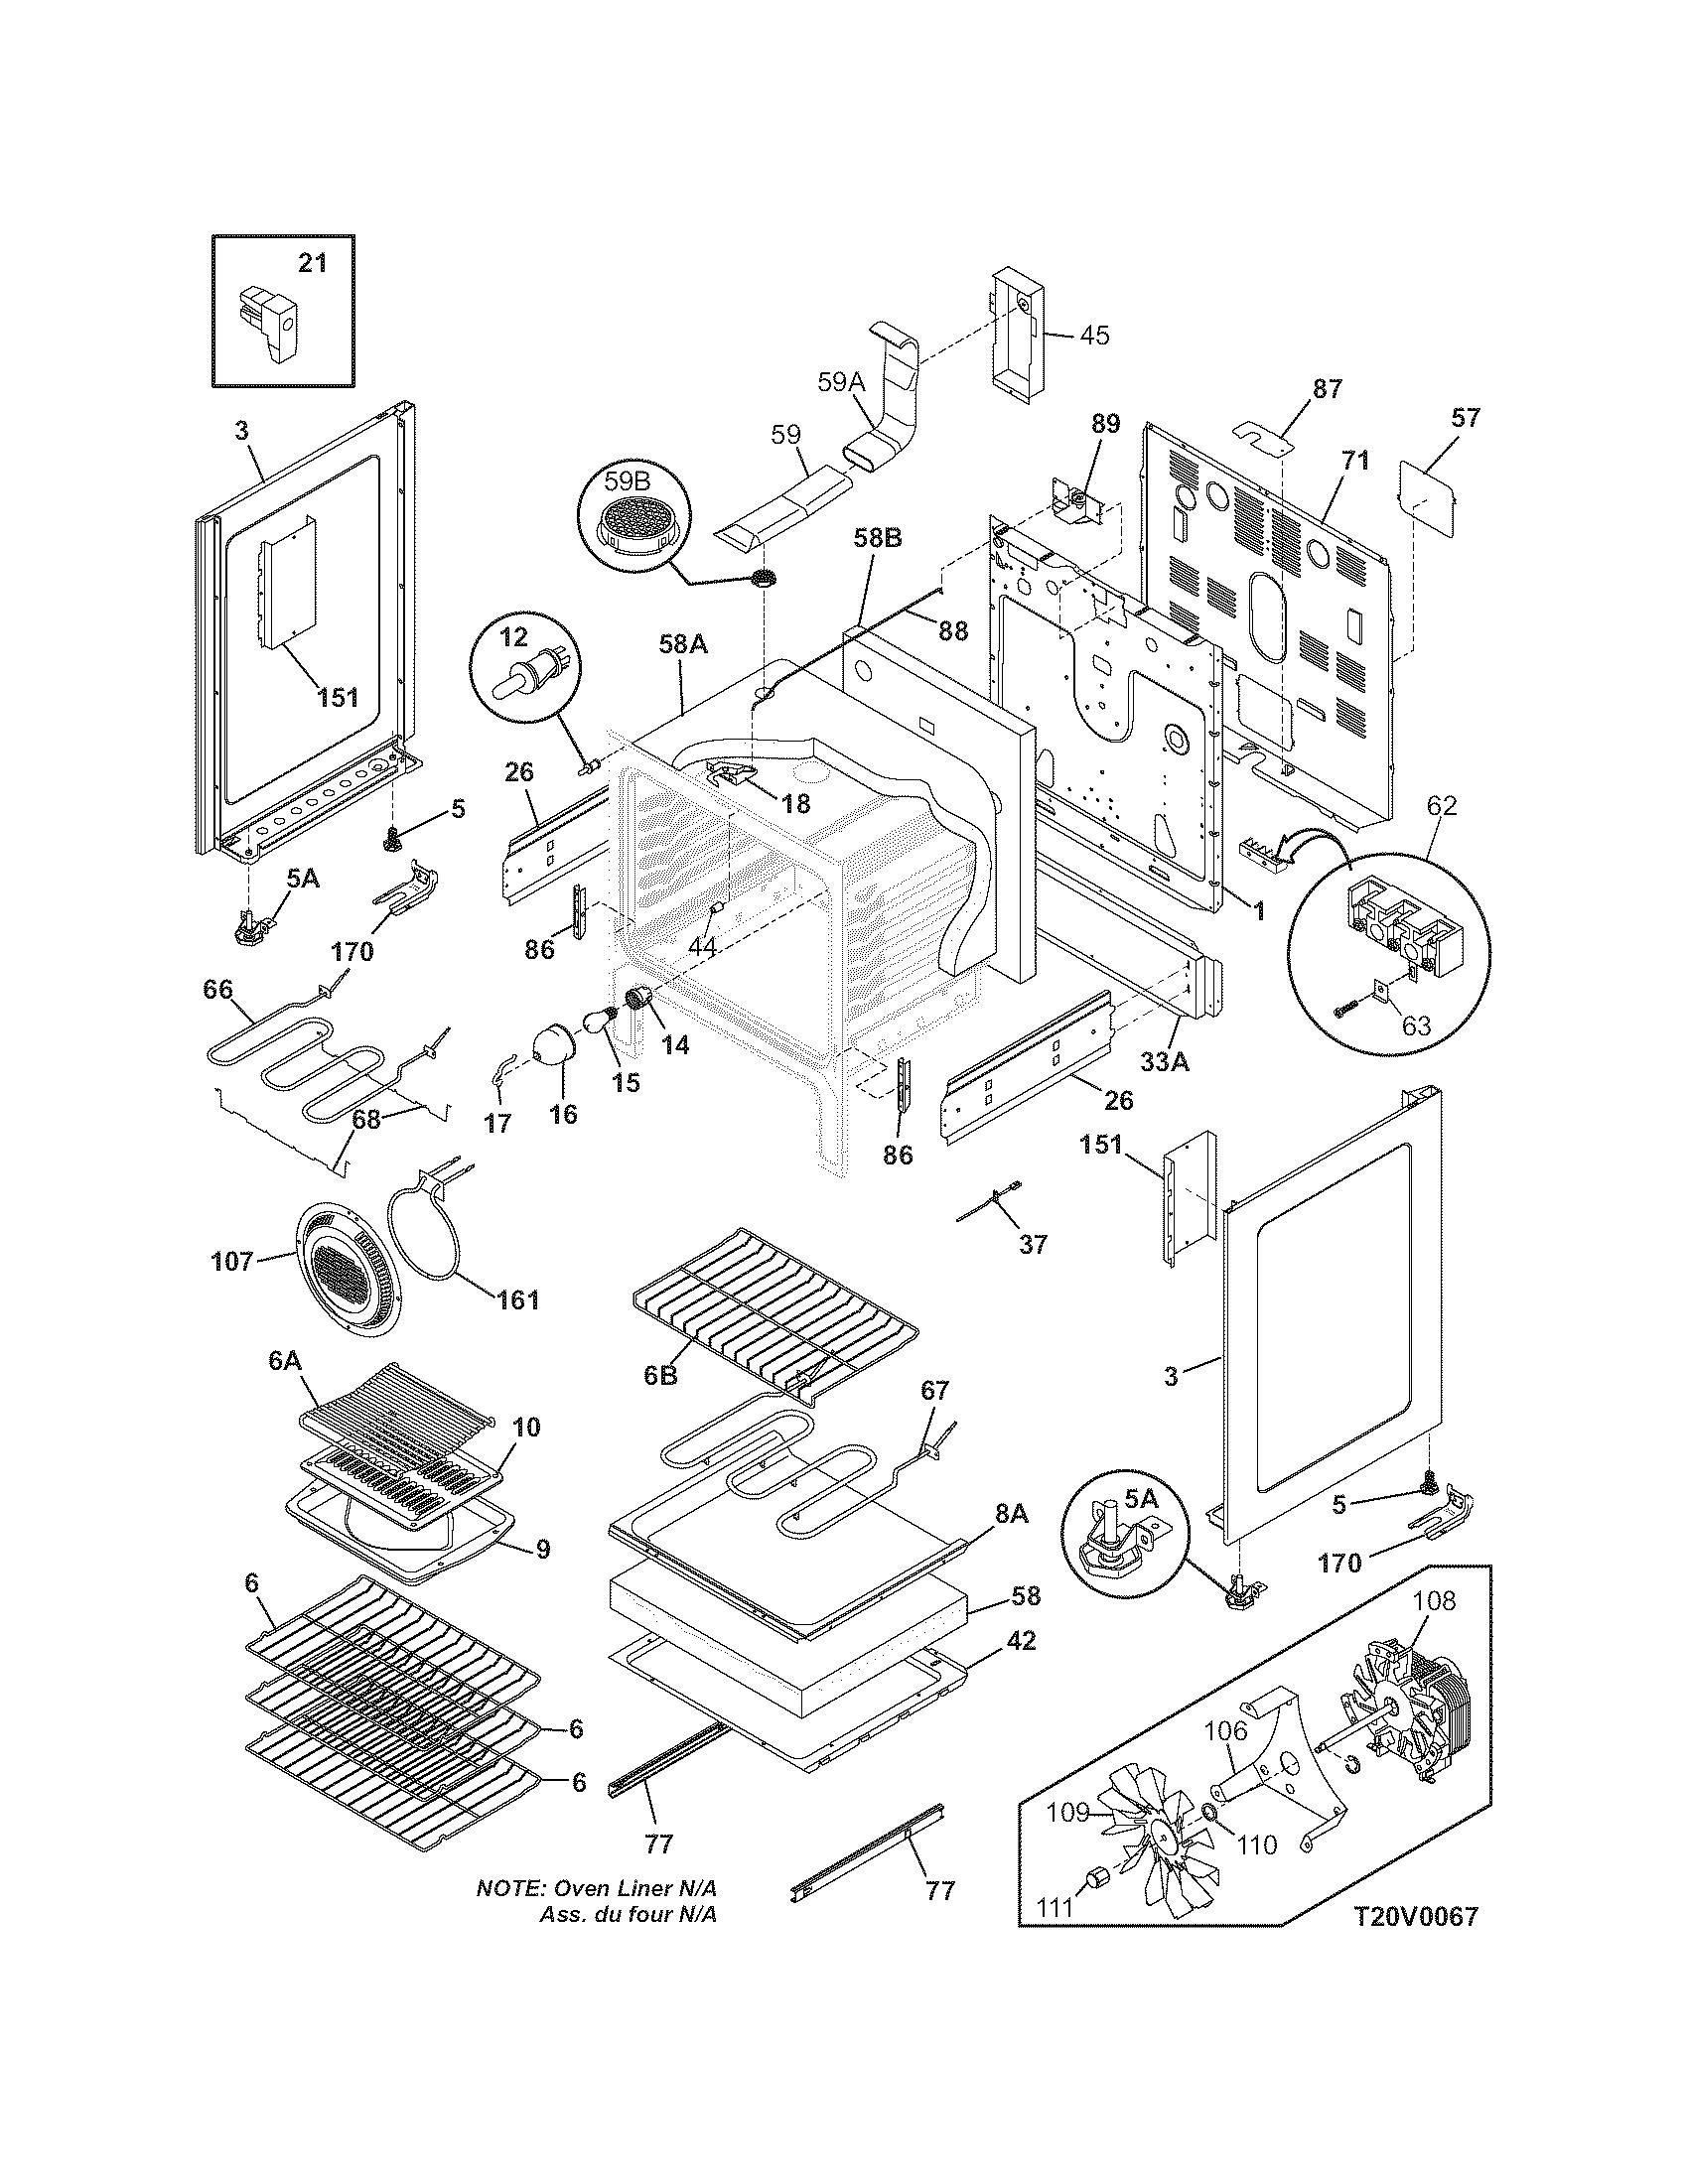 Zebra Body Part Diagram